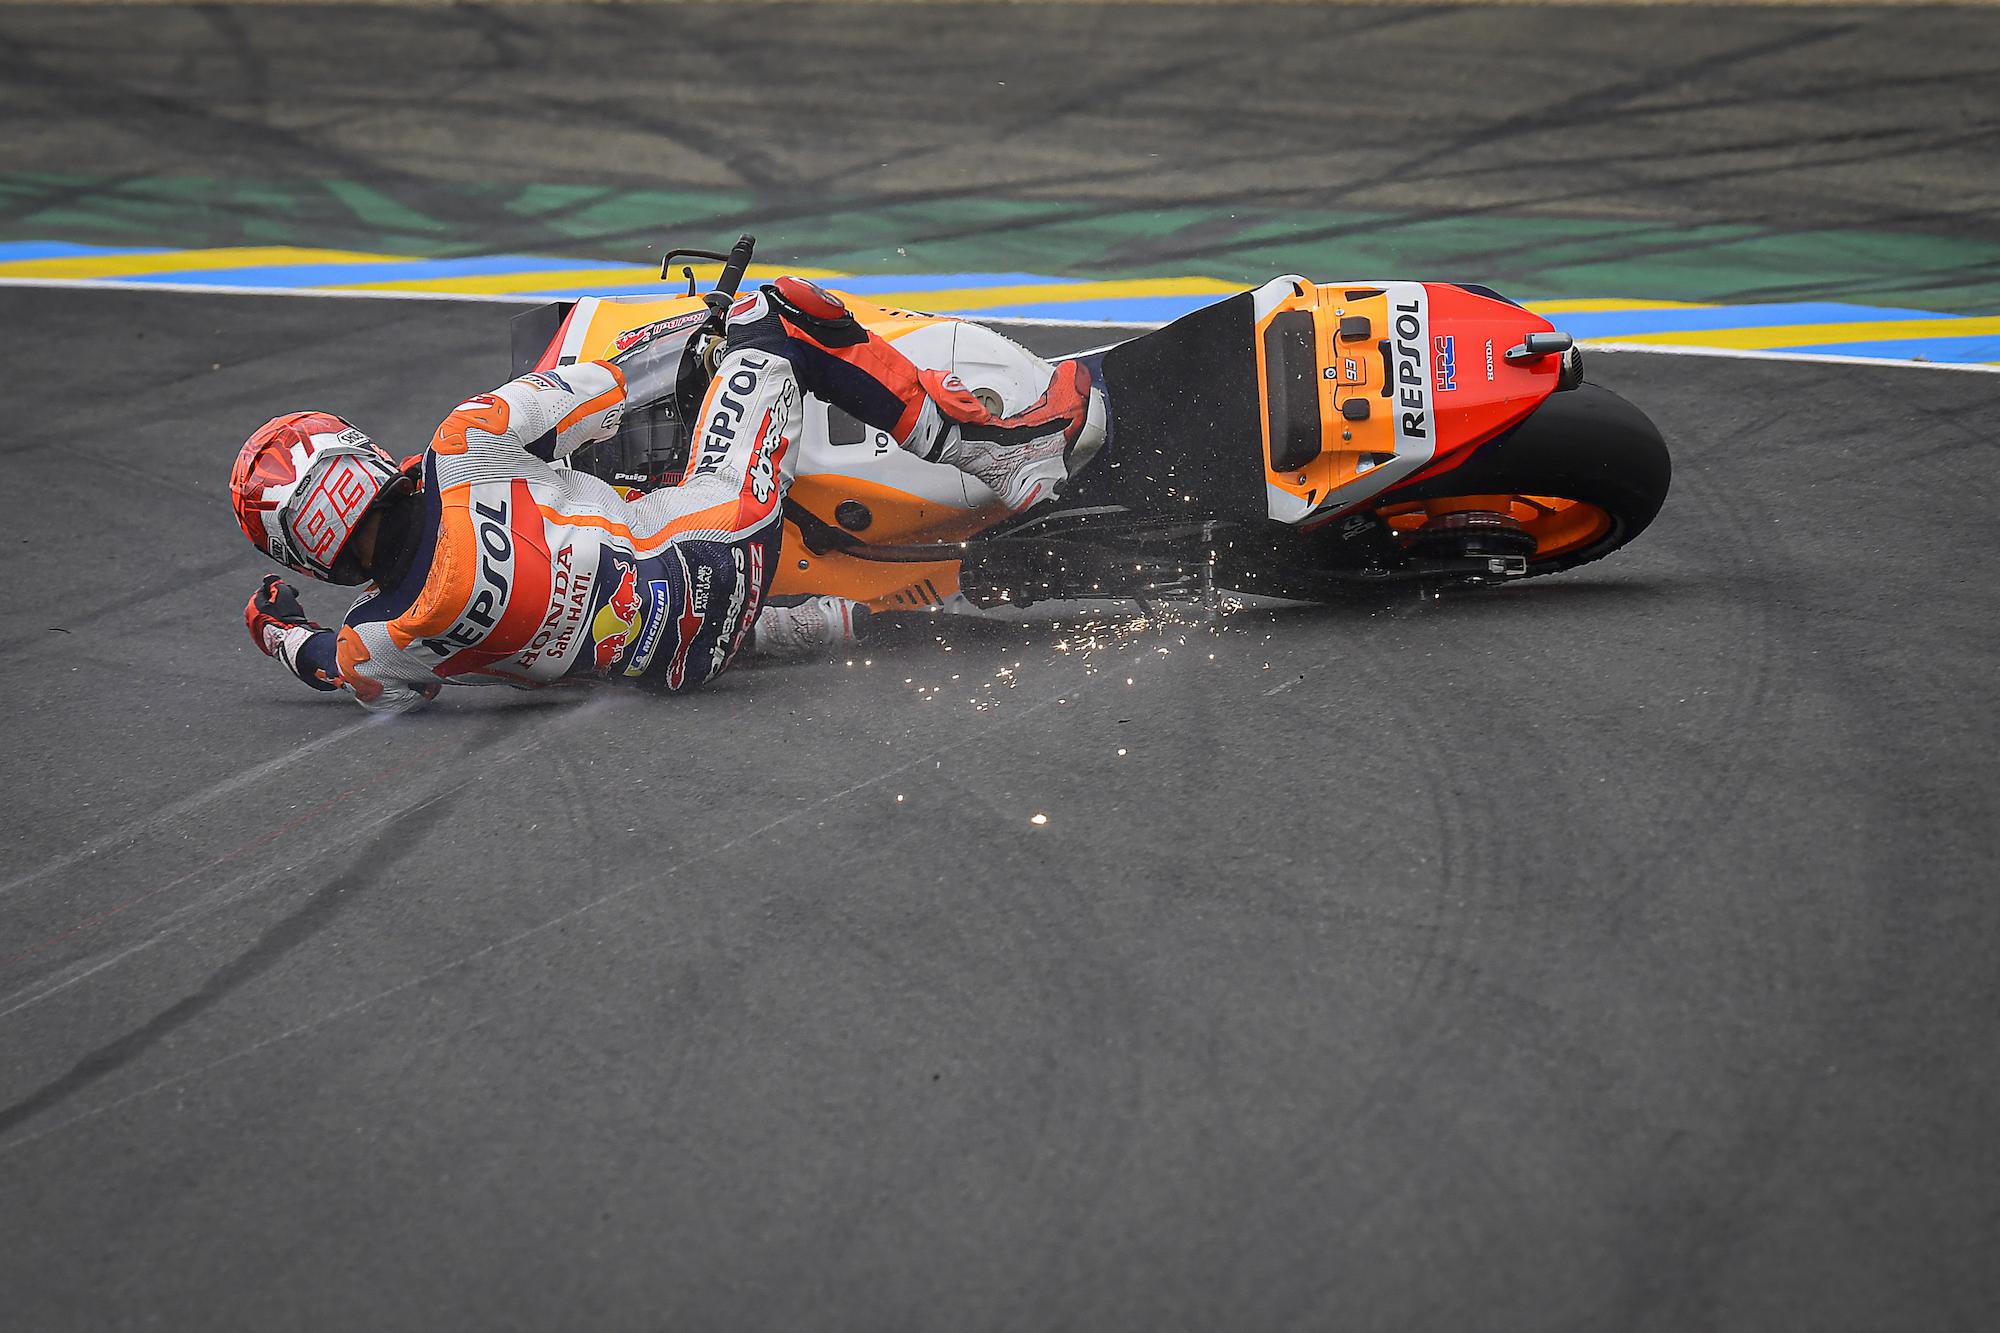 Marc Marquez – upadek podczas GP Francji 2021